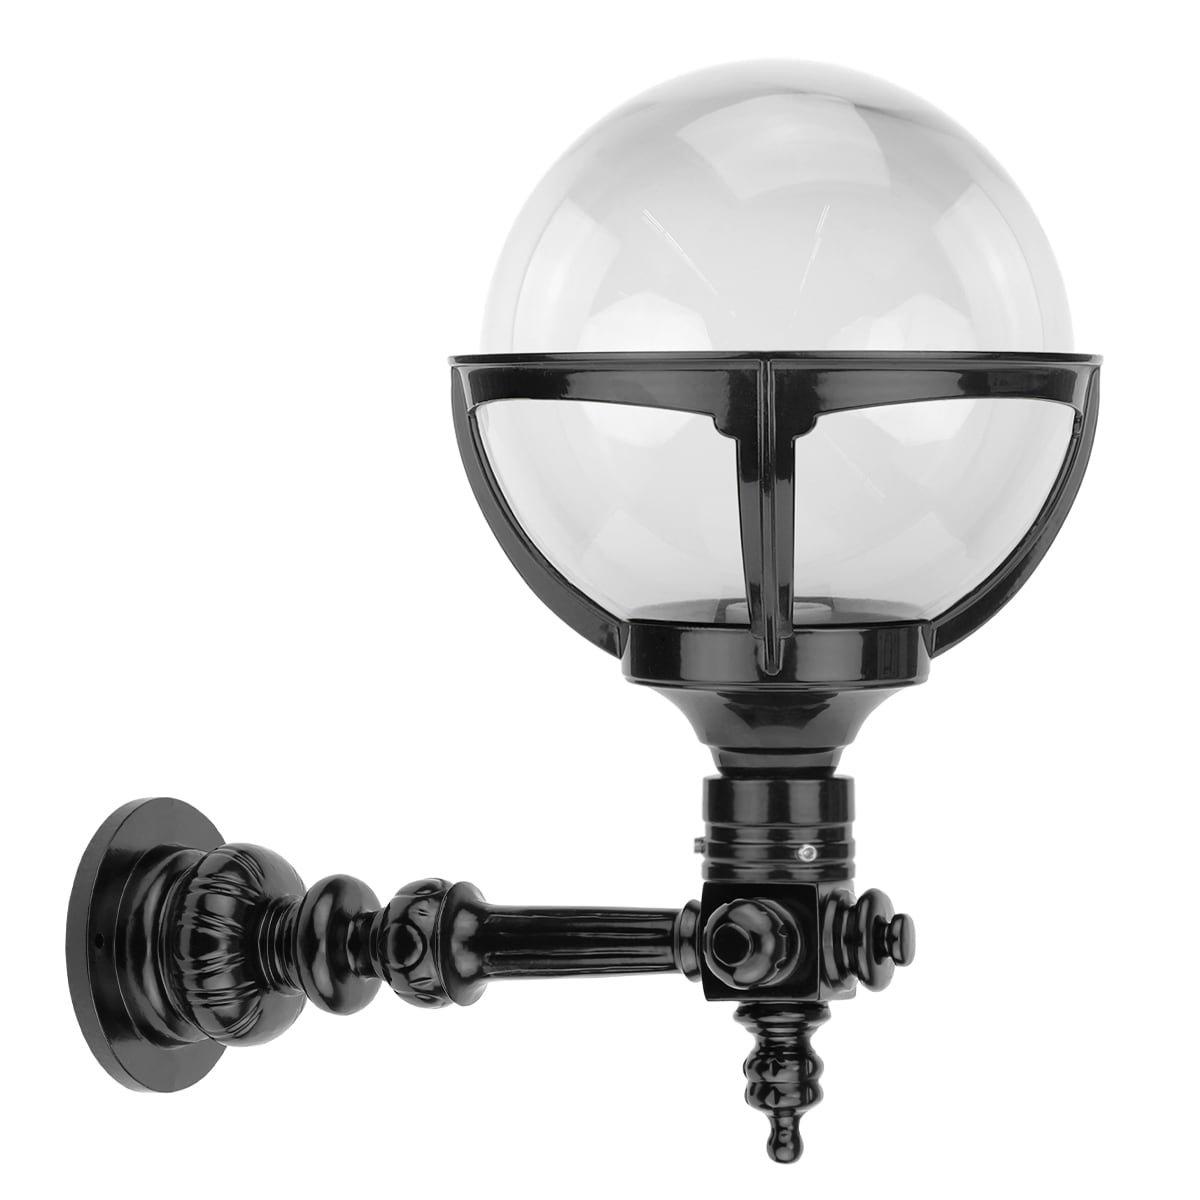 Facade Lighting Retro Nostalgic Sphere lamp on rod clear glass Erichem - 40 cm